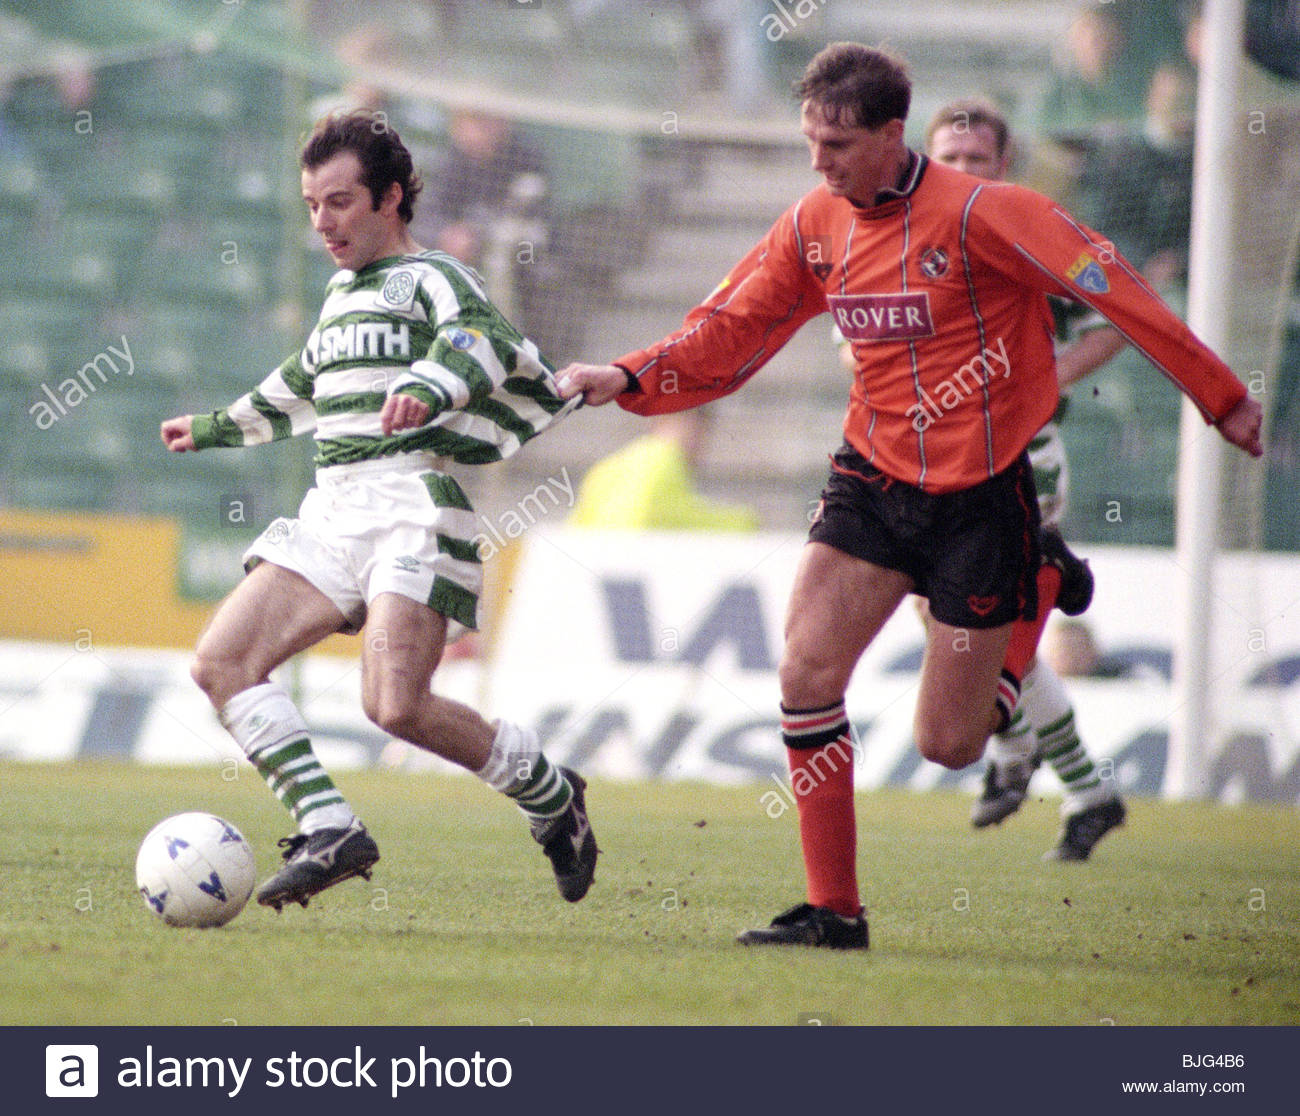 10/03/96 TENNENT'S SCOTTISH CUP QUARTER-FINAL CELTIC V DUNDEE UTD (2-1) CELTIC PARK - GLASGOW Celtic's Brian - Stock Image